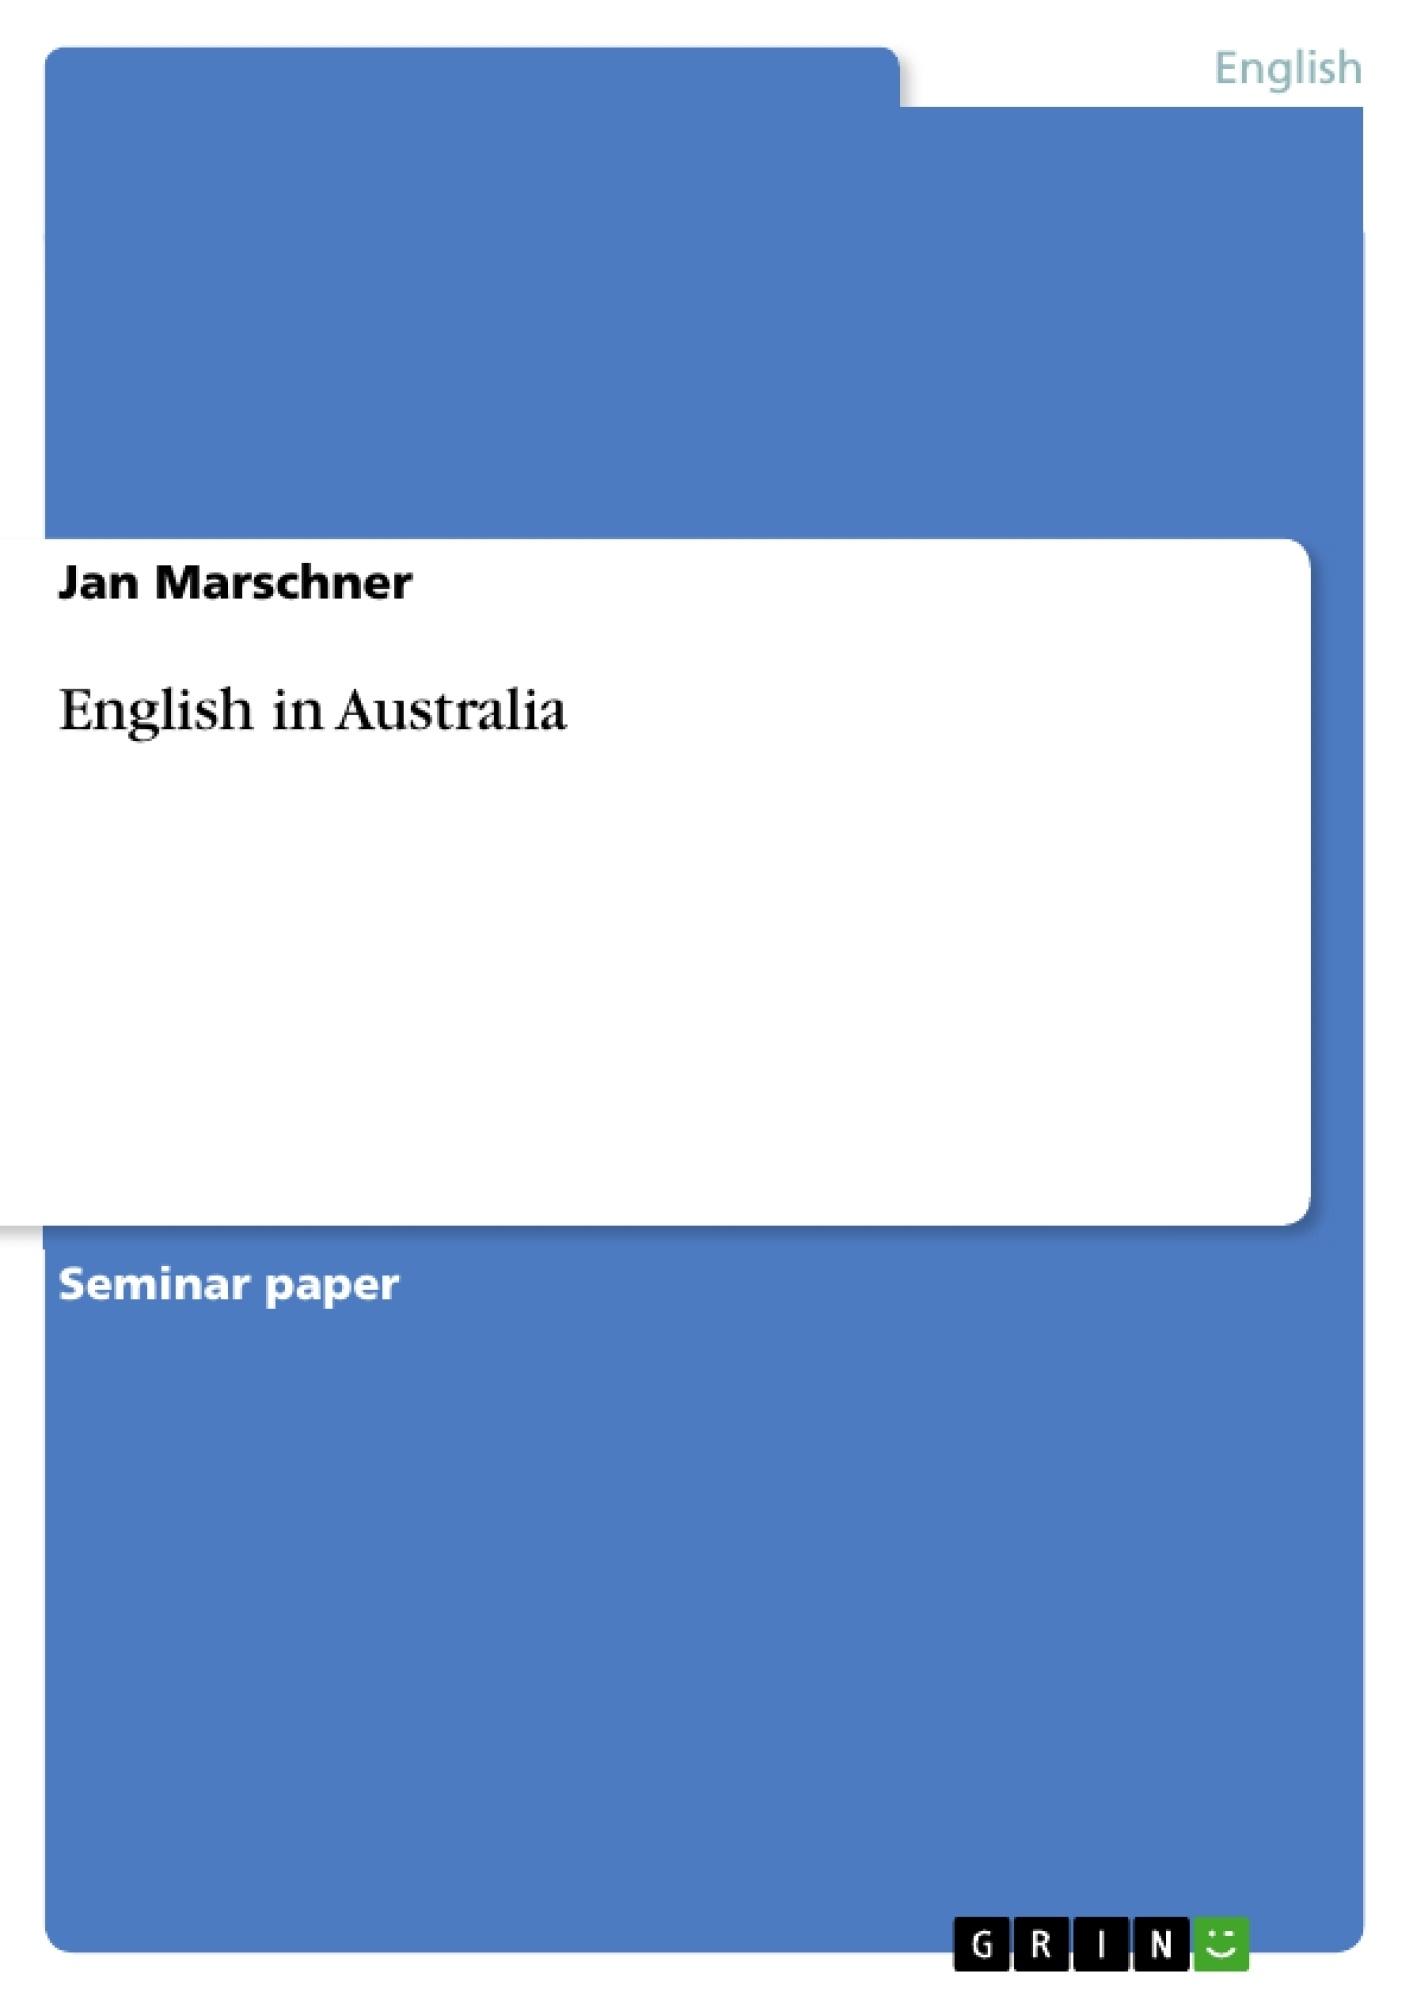 Title: English in Australia